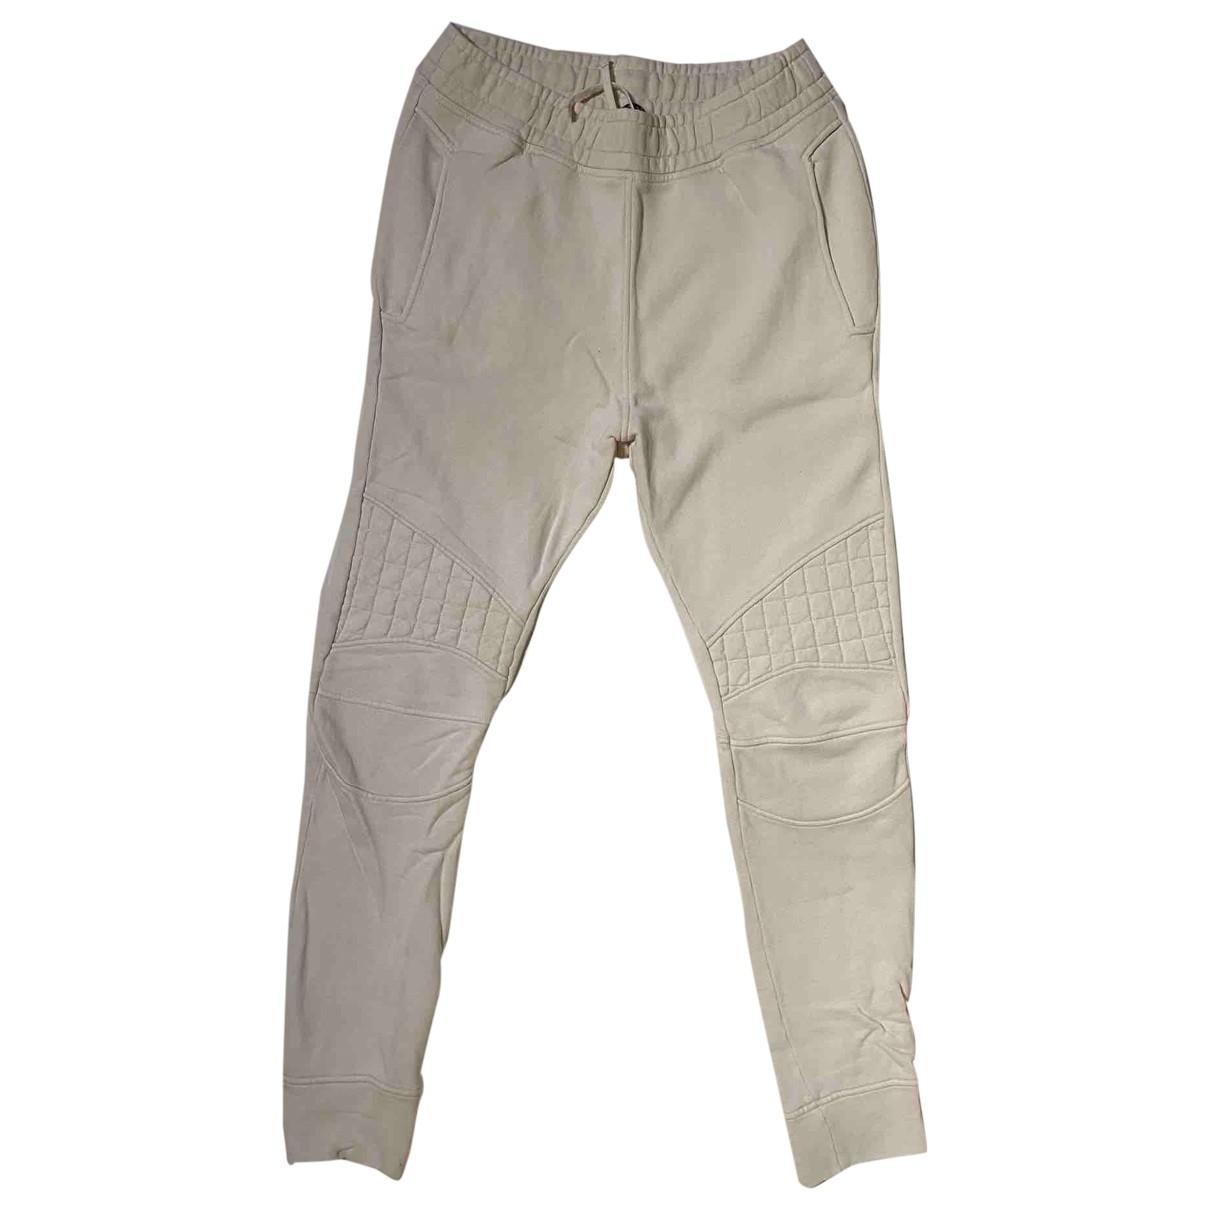 Balmain \N Beige Cotton Trousers for Men M International